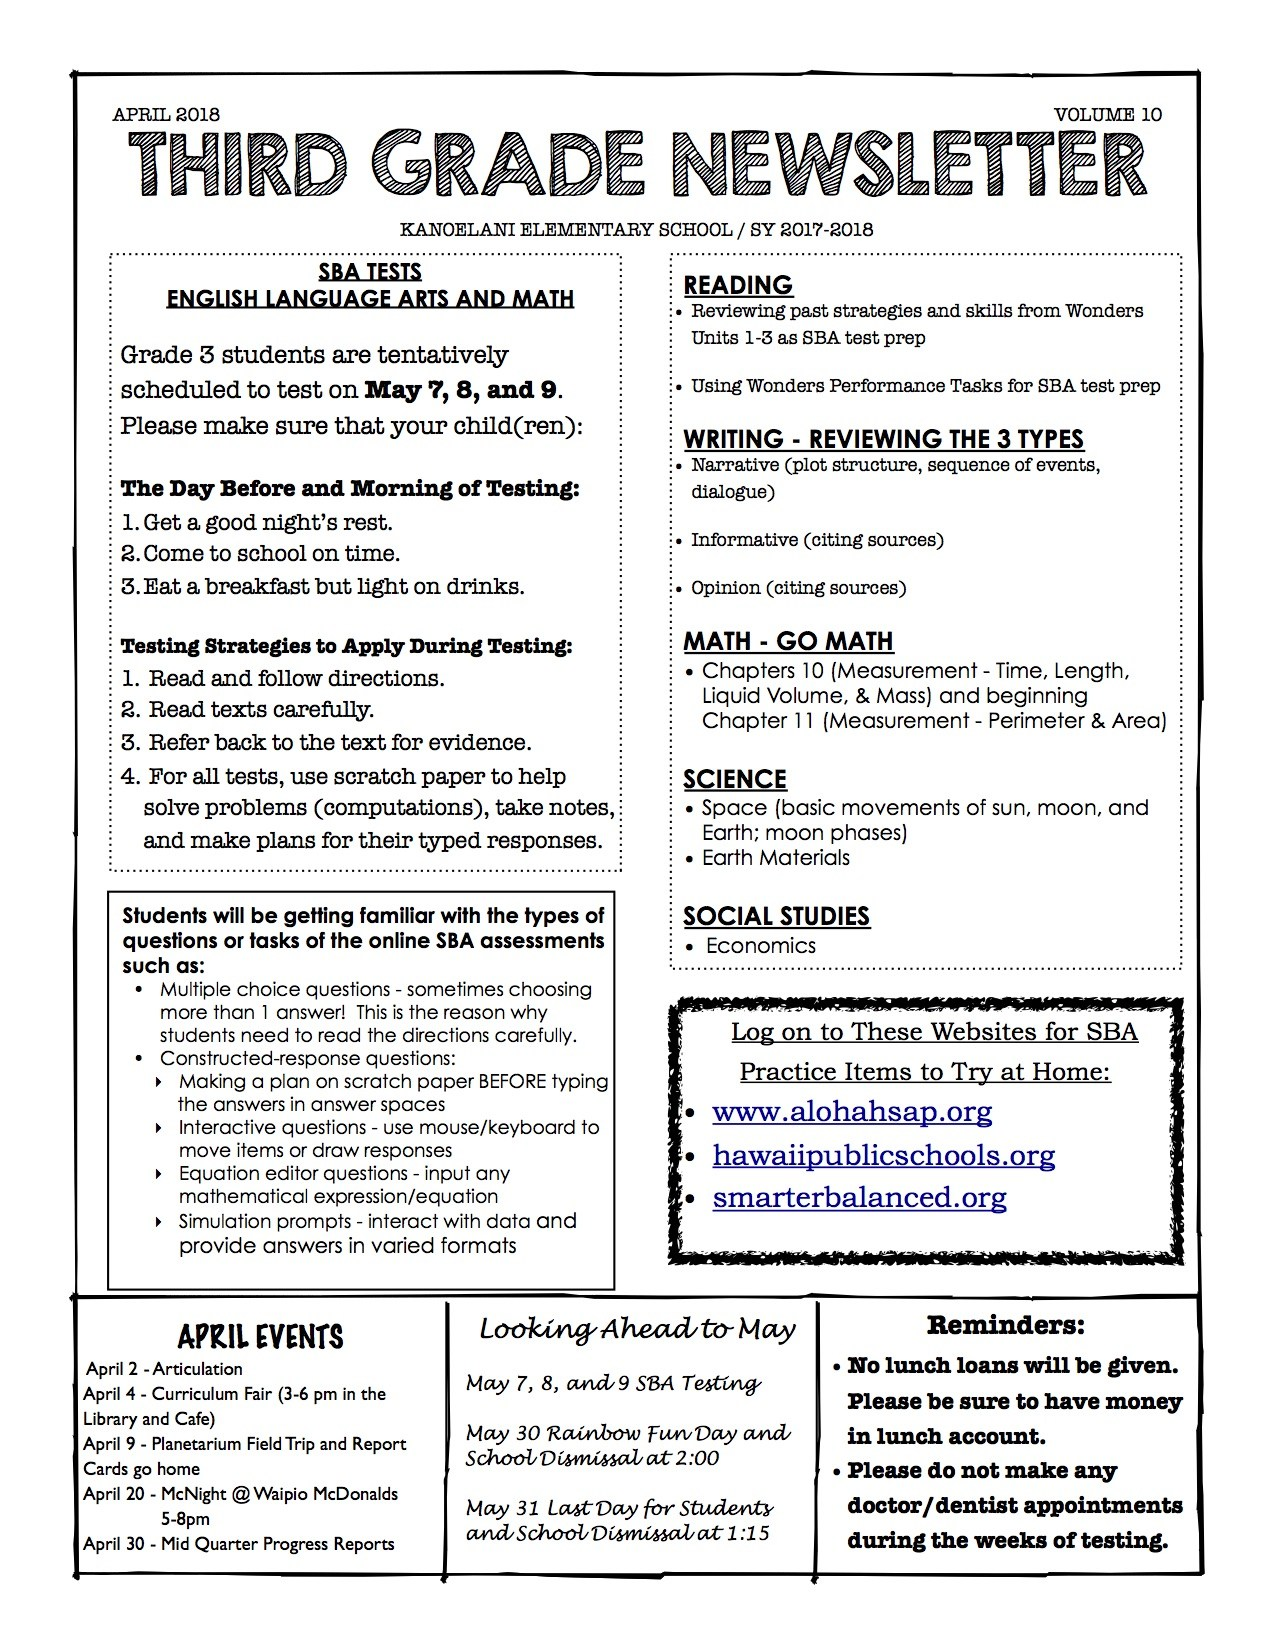 Enchanting Math Cafe 3rd Grade Image - General Worksheet ...